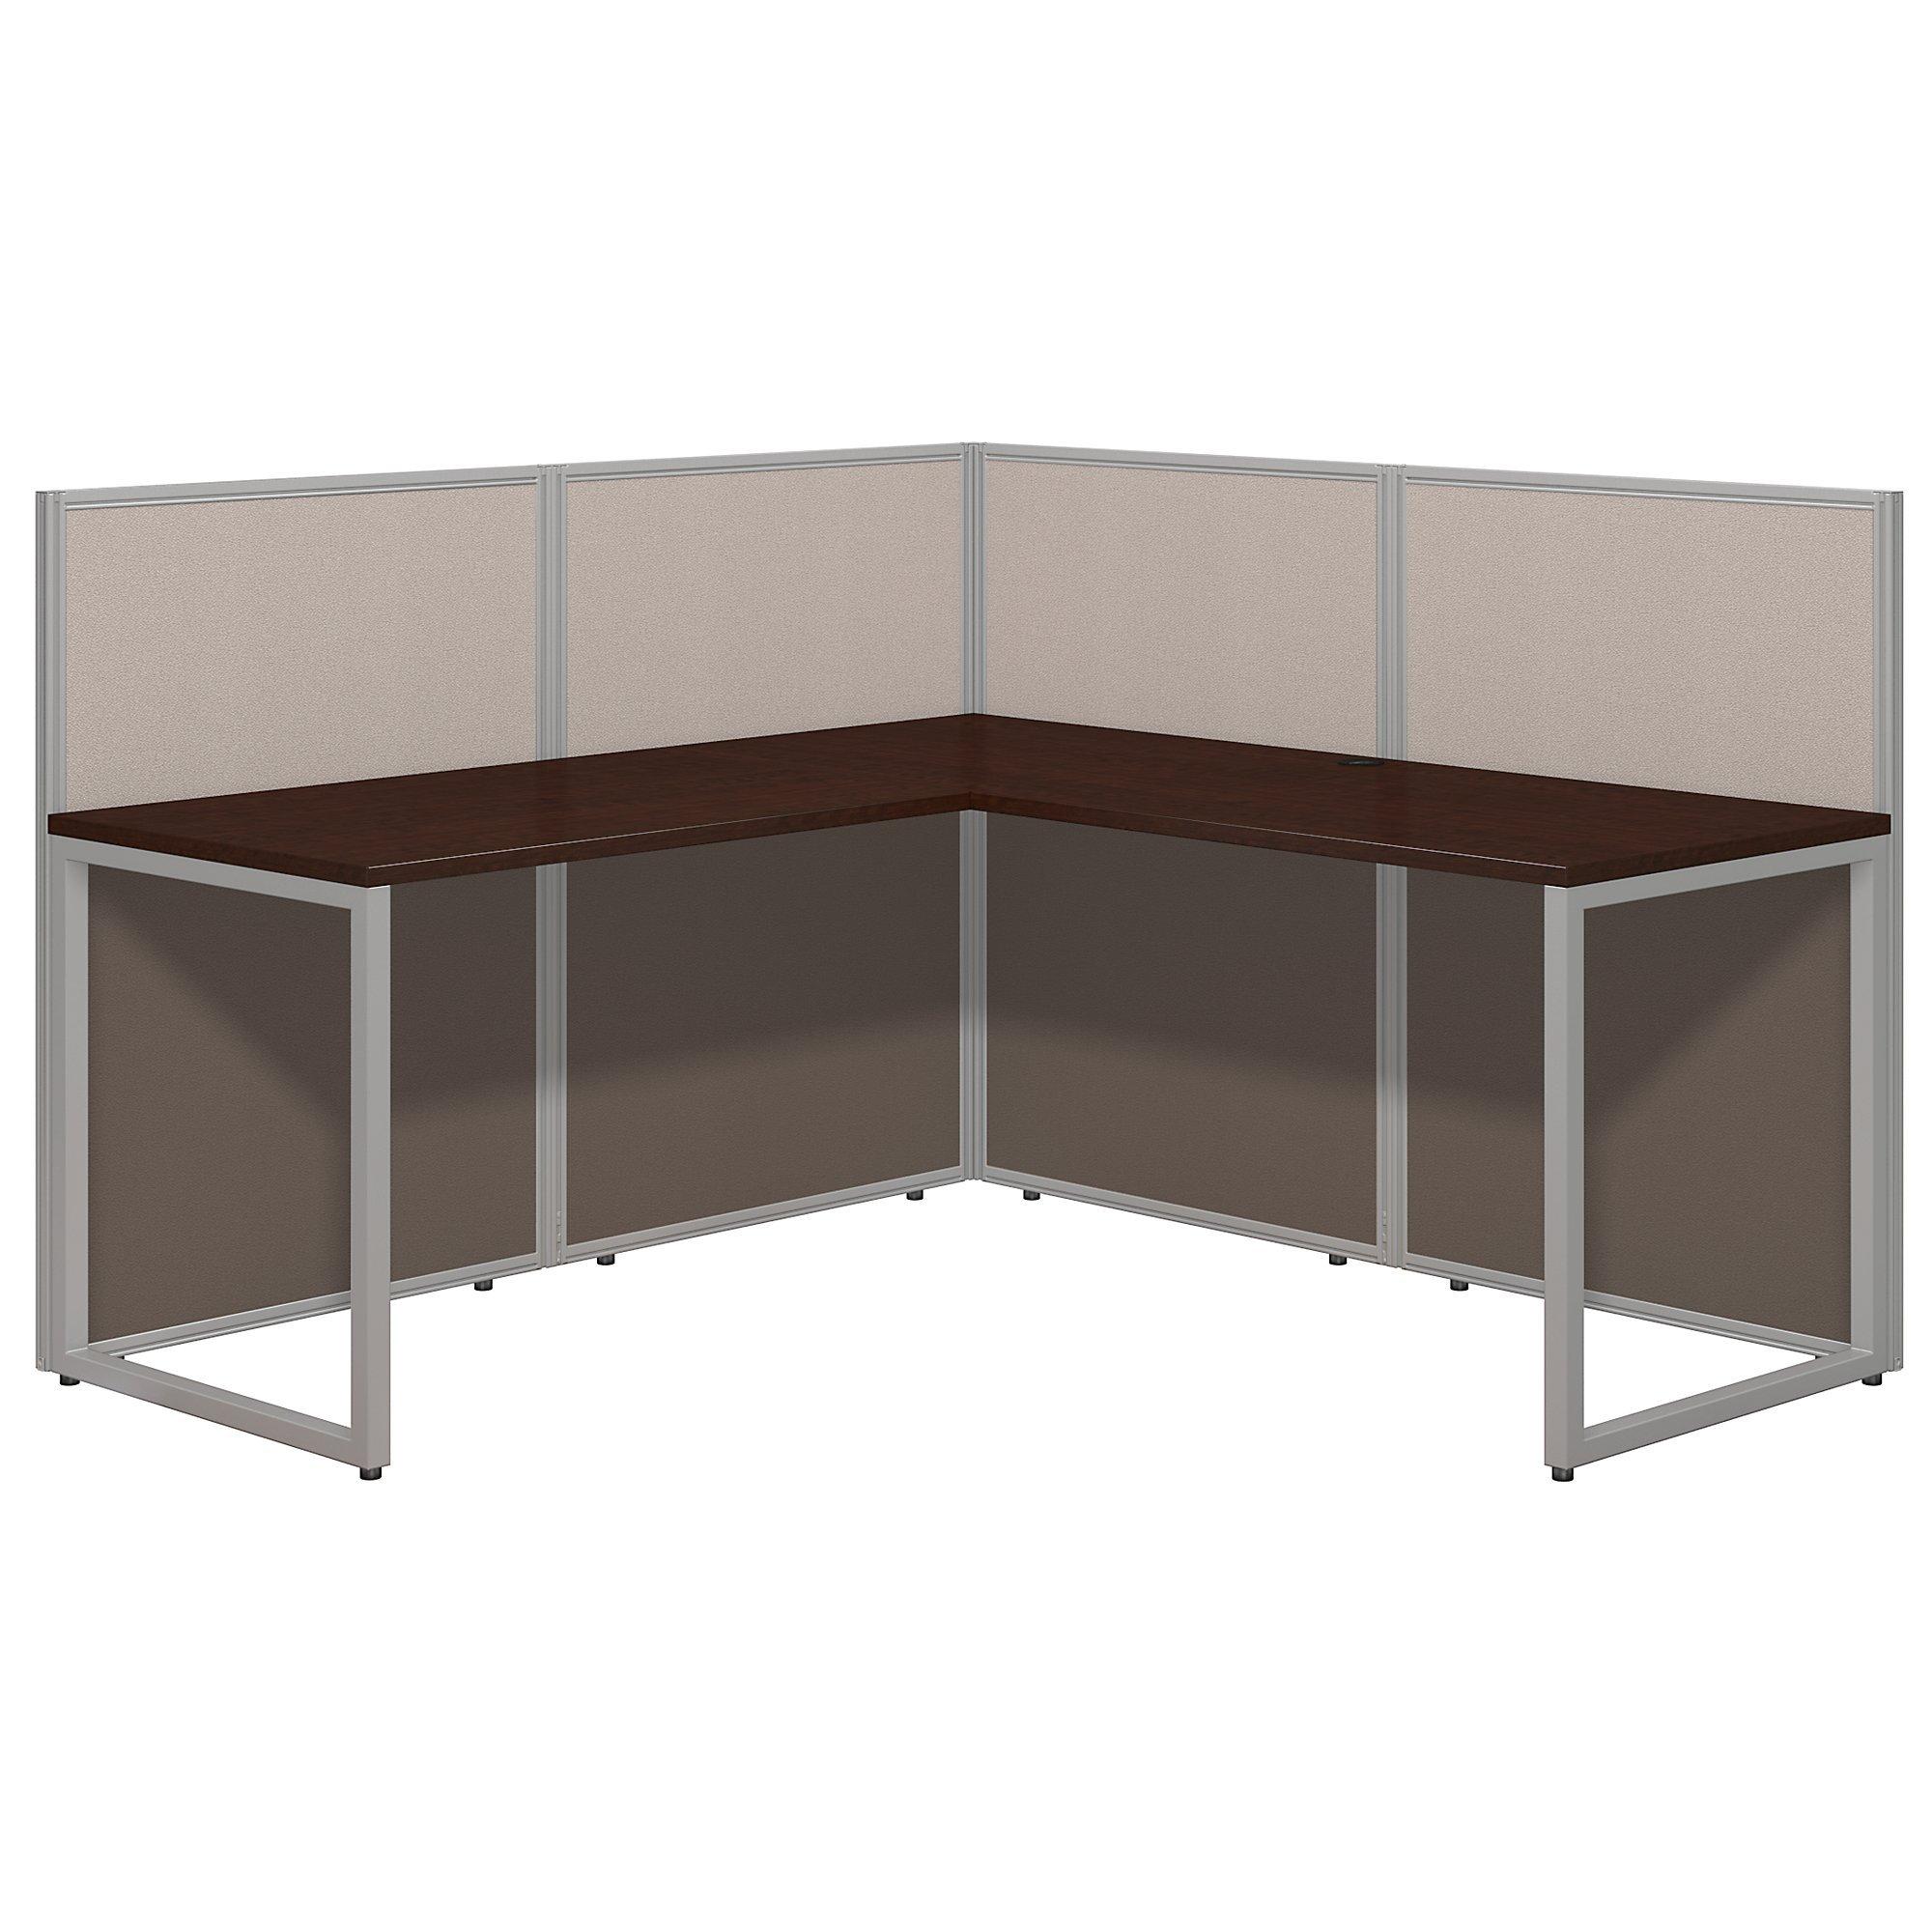 Bush Business Furniture Easy Office 60W L Shaped Desk Open Office in Mocha Cherry by Bush Business Furniture (Image #1)